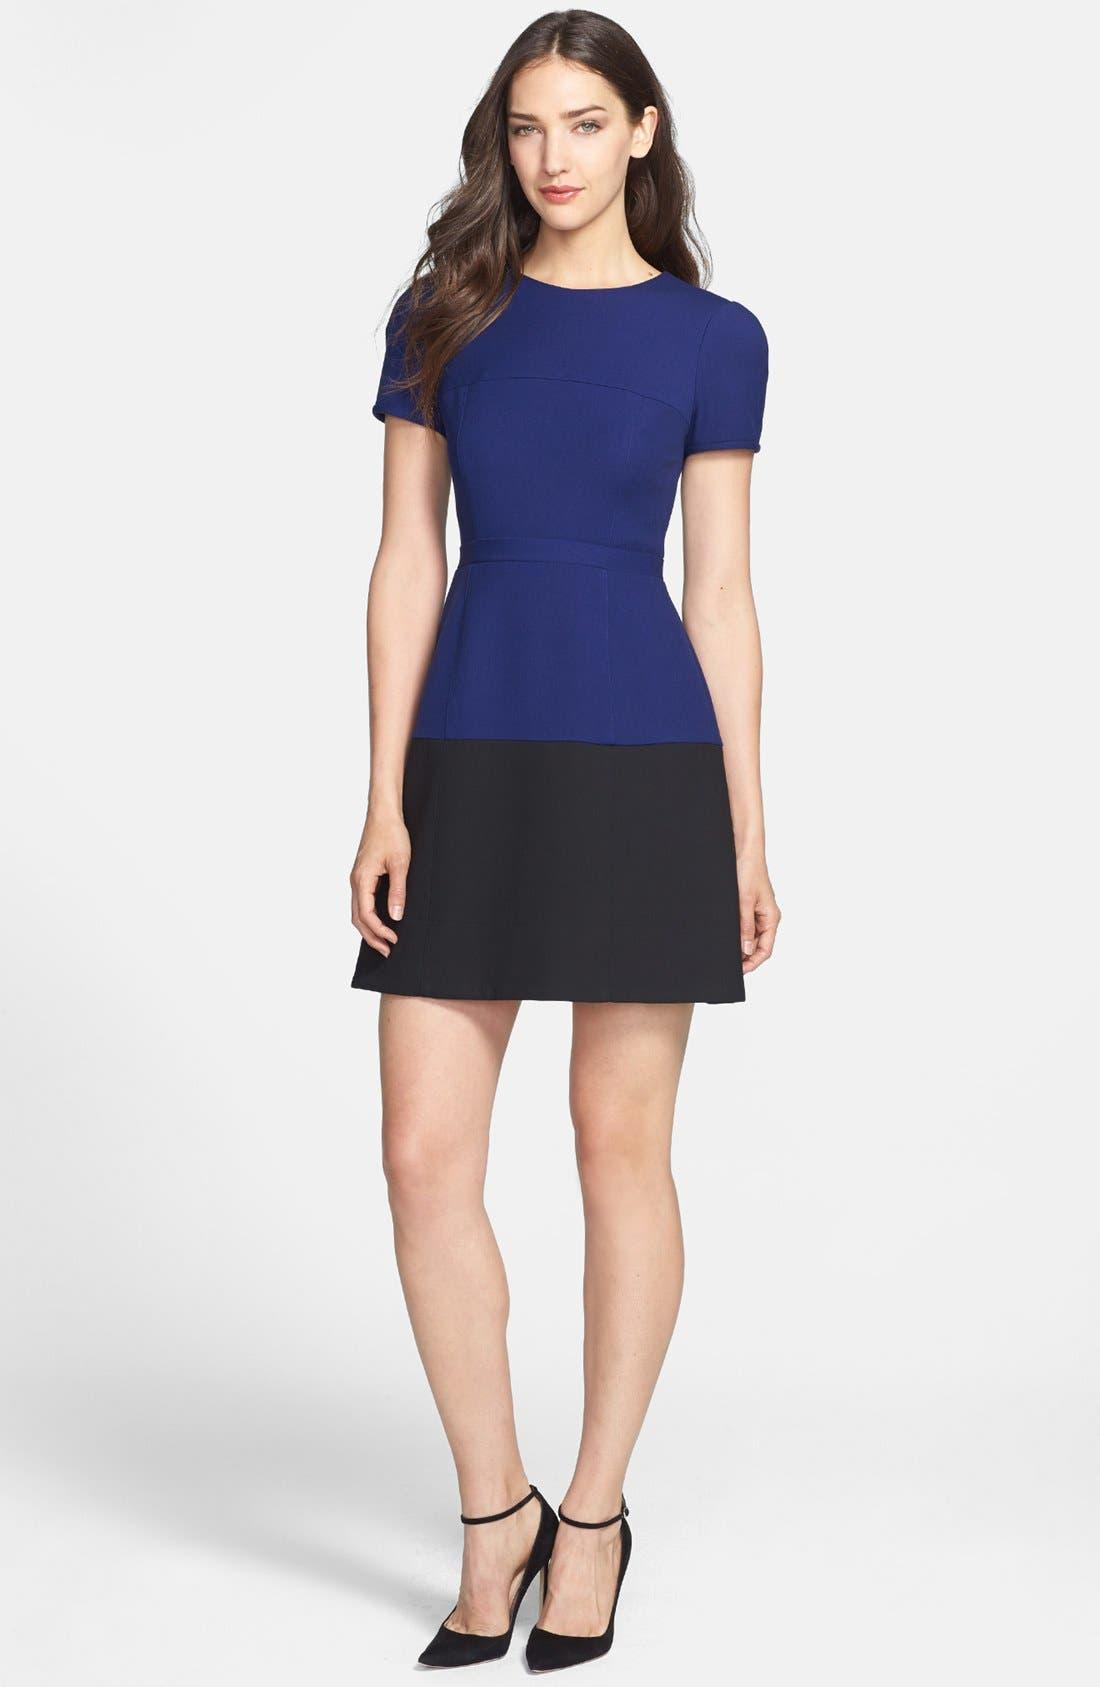 Main Image - BCBGMAXAZRIA 'Hannah' Colorblock Fit & Flare Dress